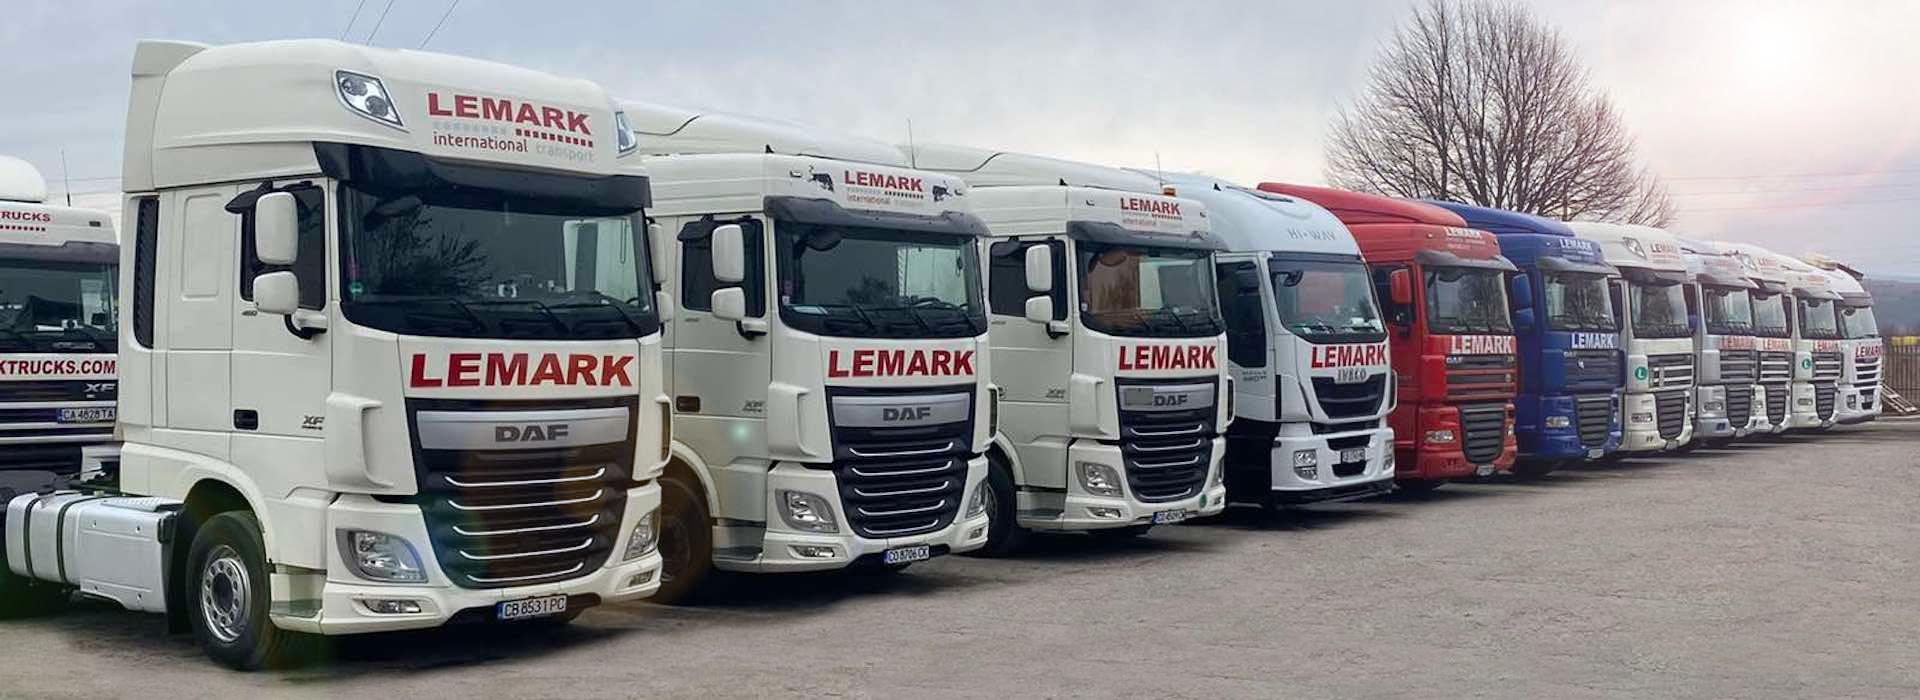 Снимка на камиони